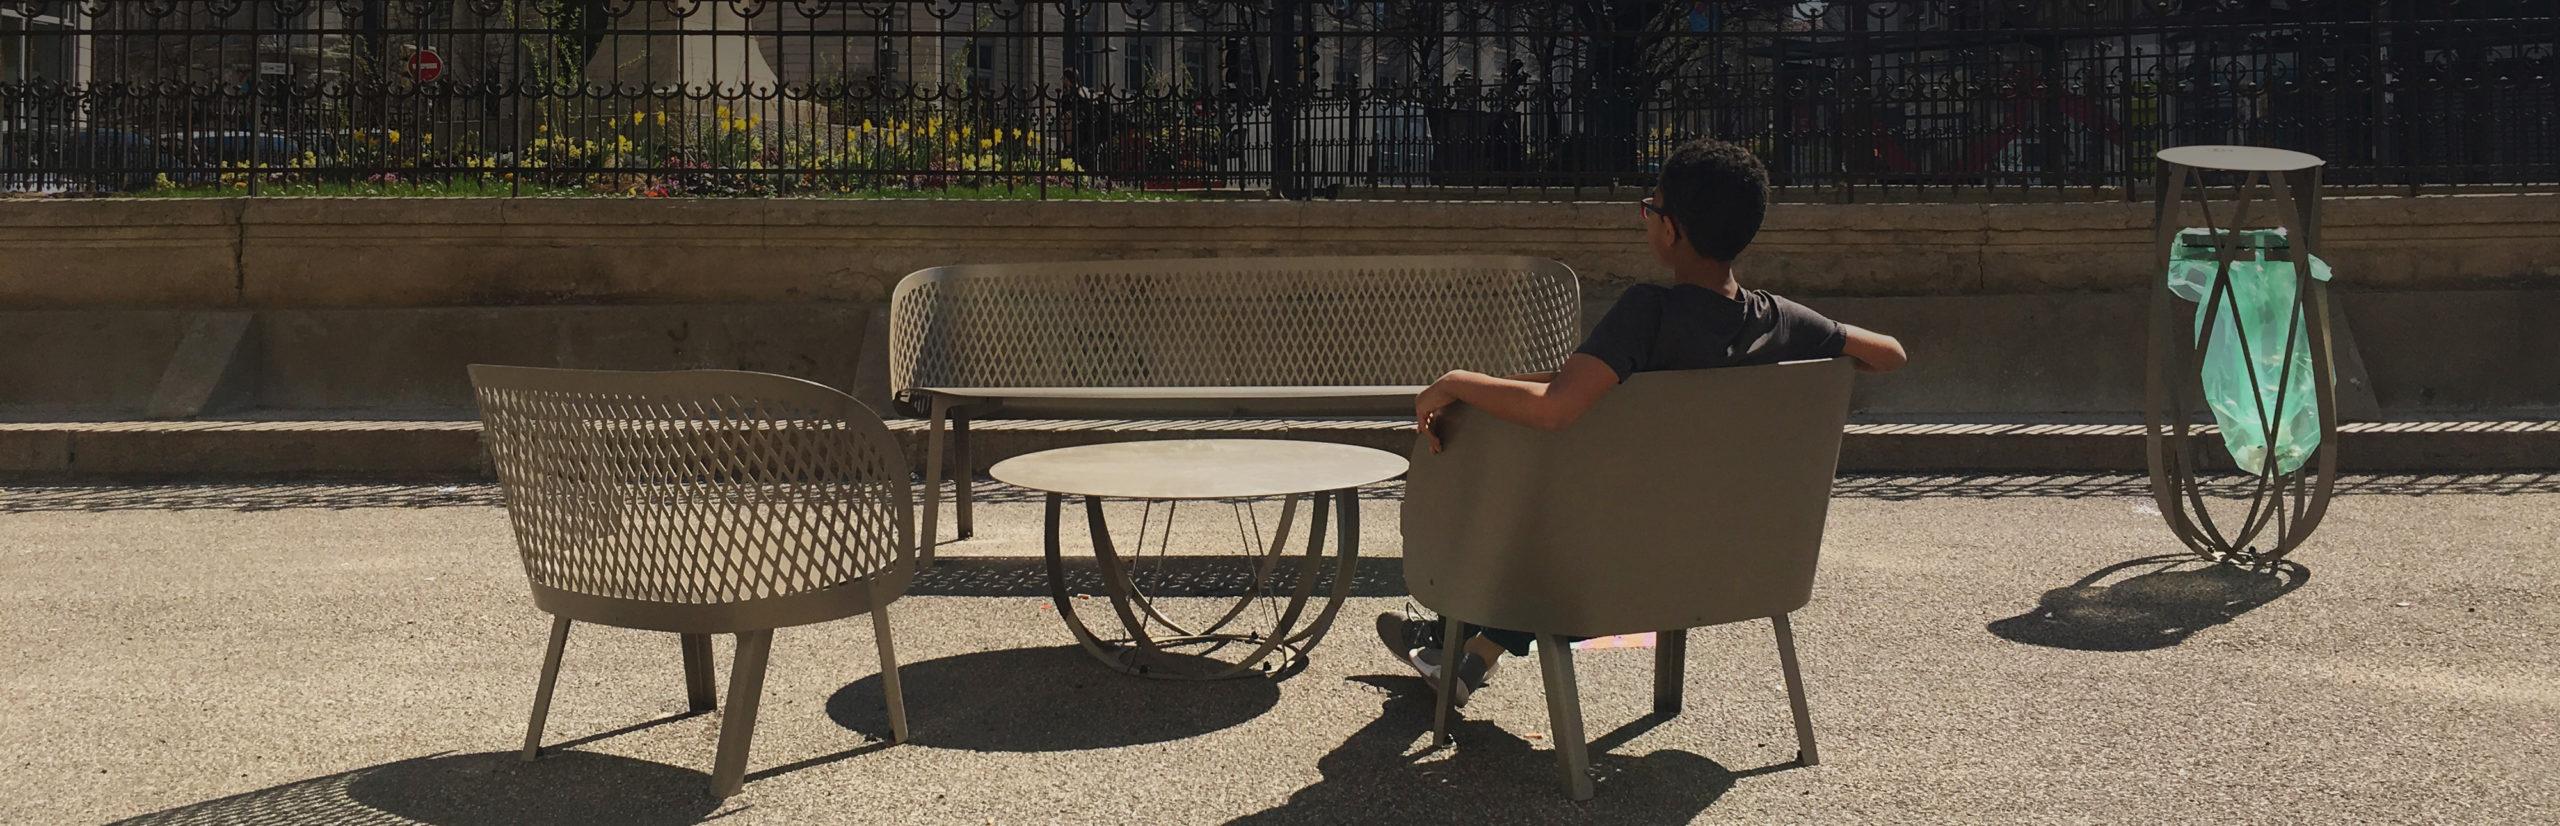 objets-publics-mobilier-urbain-design-slider-5